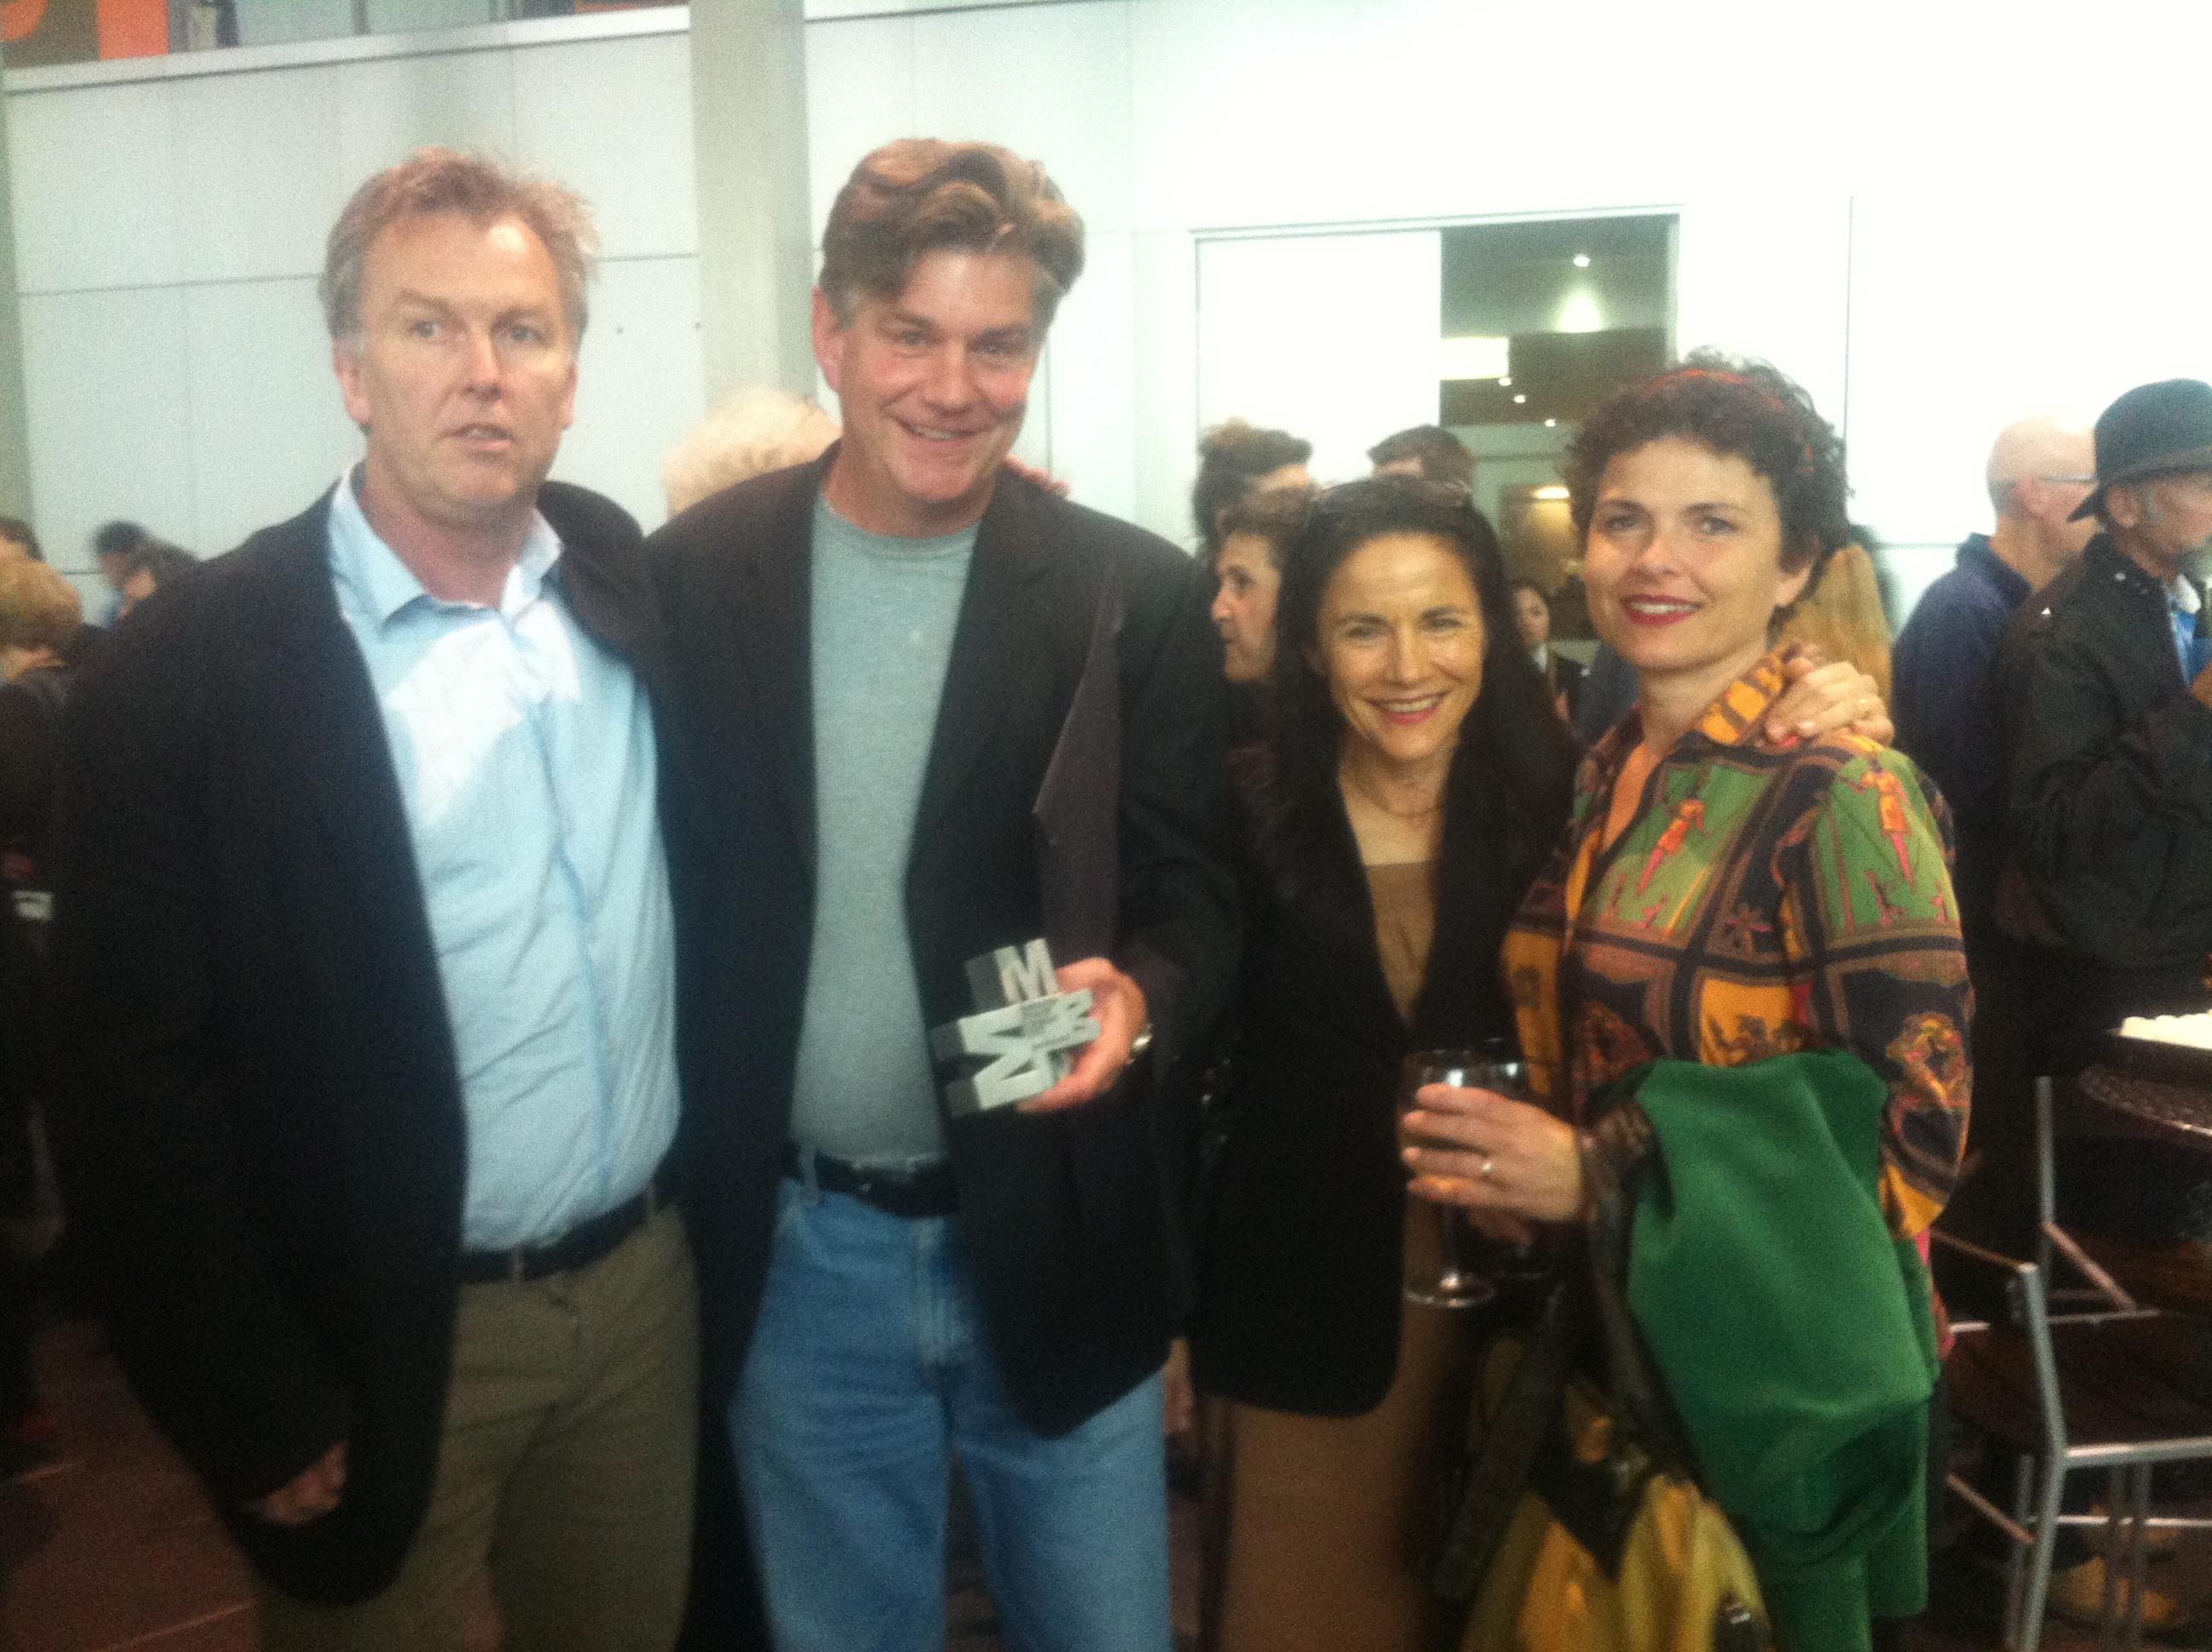 Publisher Michael Heyward, Craig Sherborne, Senior Editor Penny Hueston and Craig's partner, Janet.